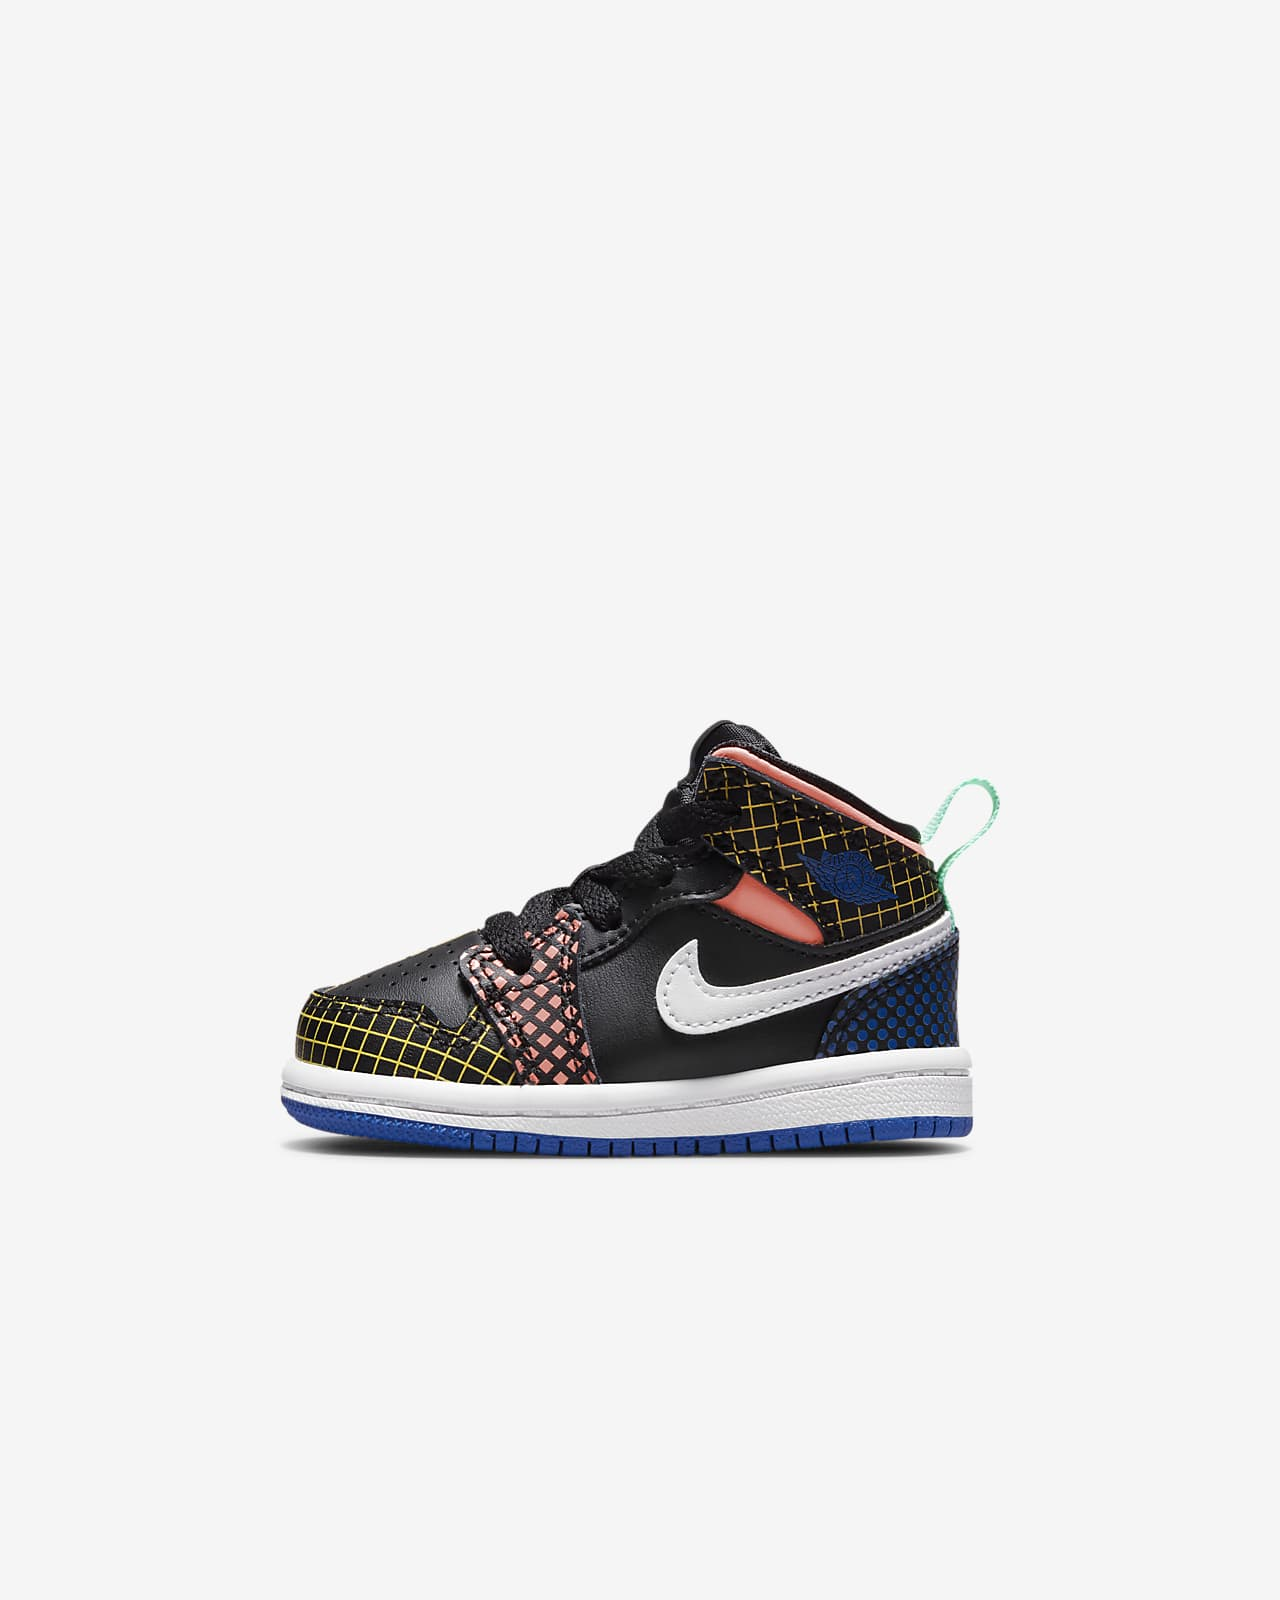 Jordan 1 Mid MMD Baby/Toddler Shoes